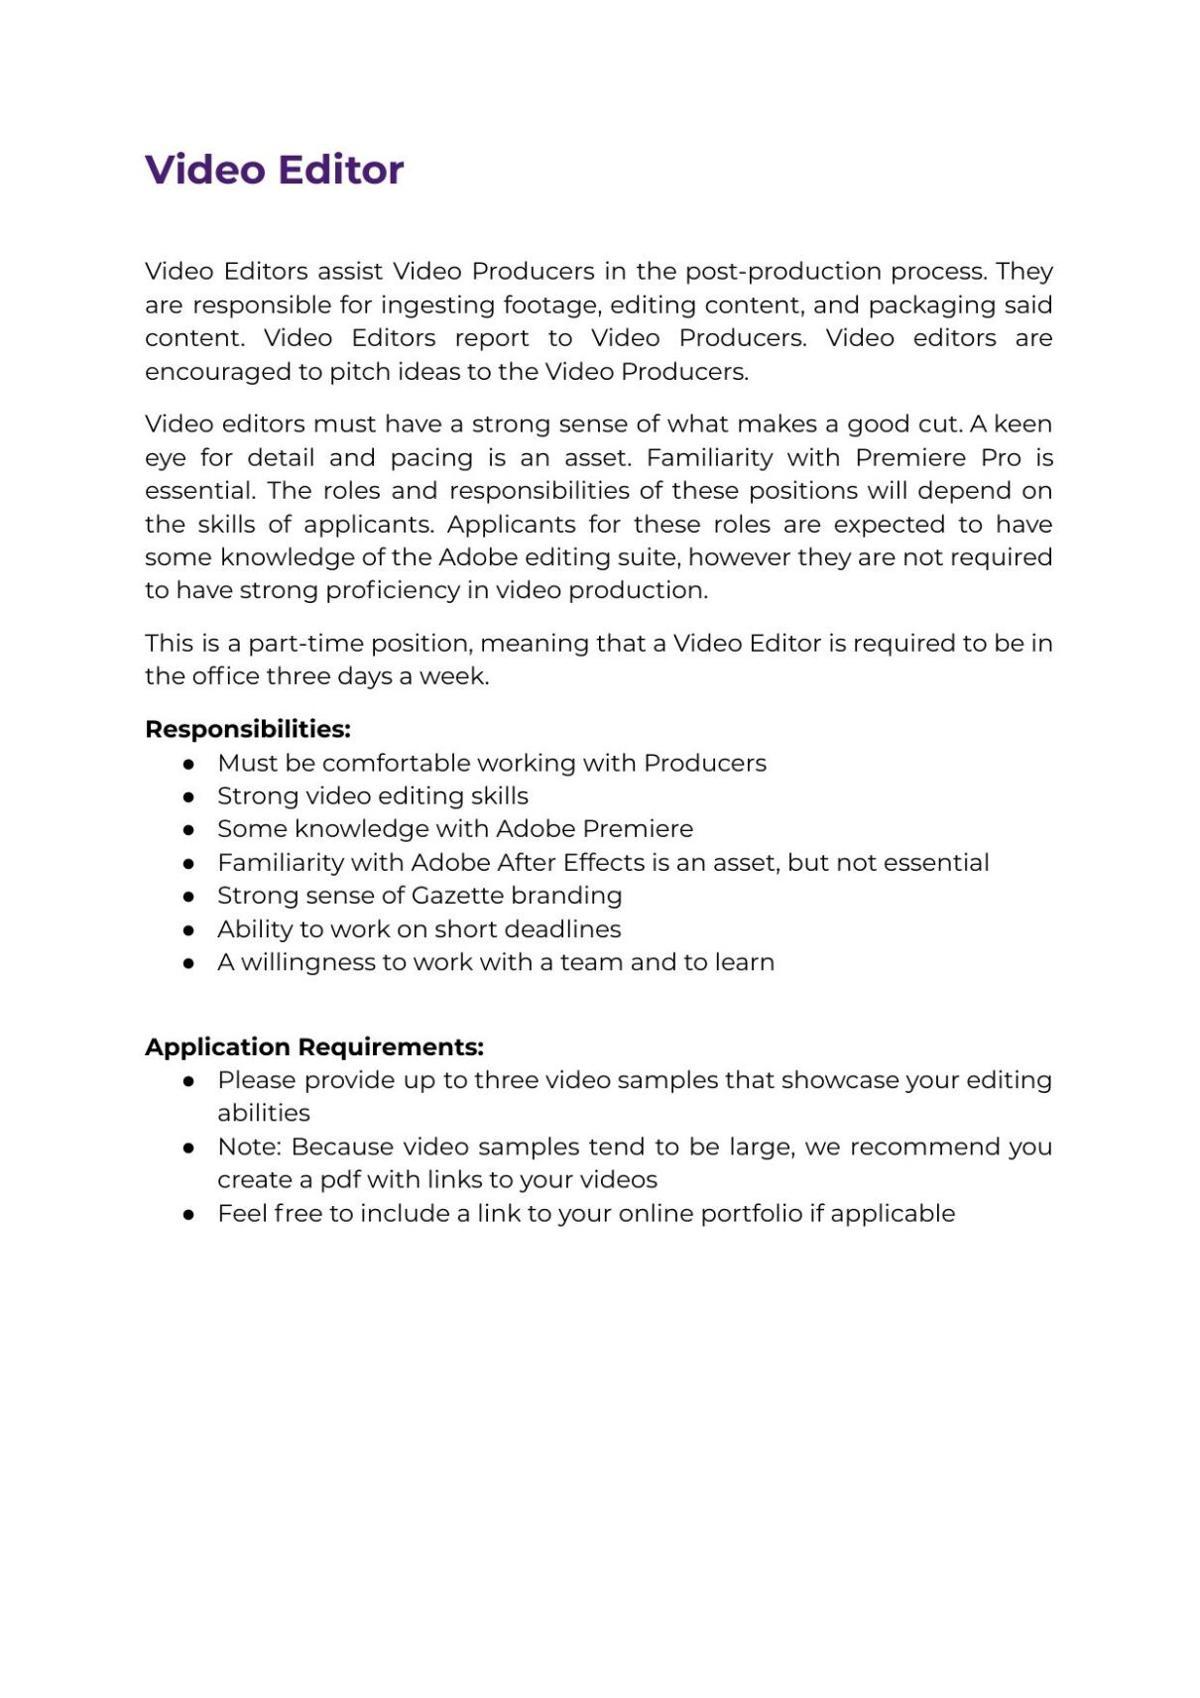 Video Editor Job Description 2021